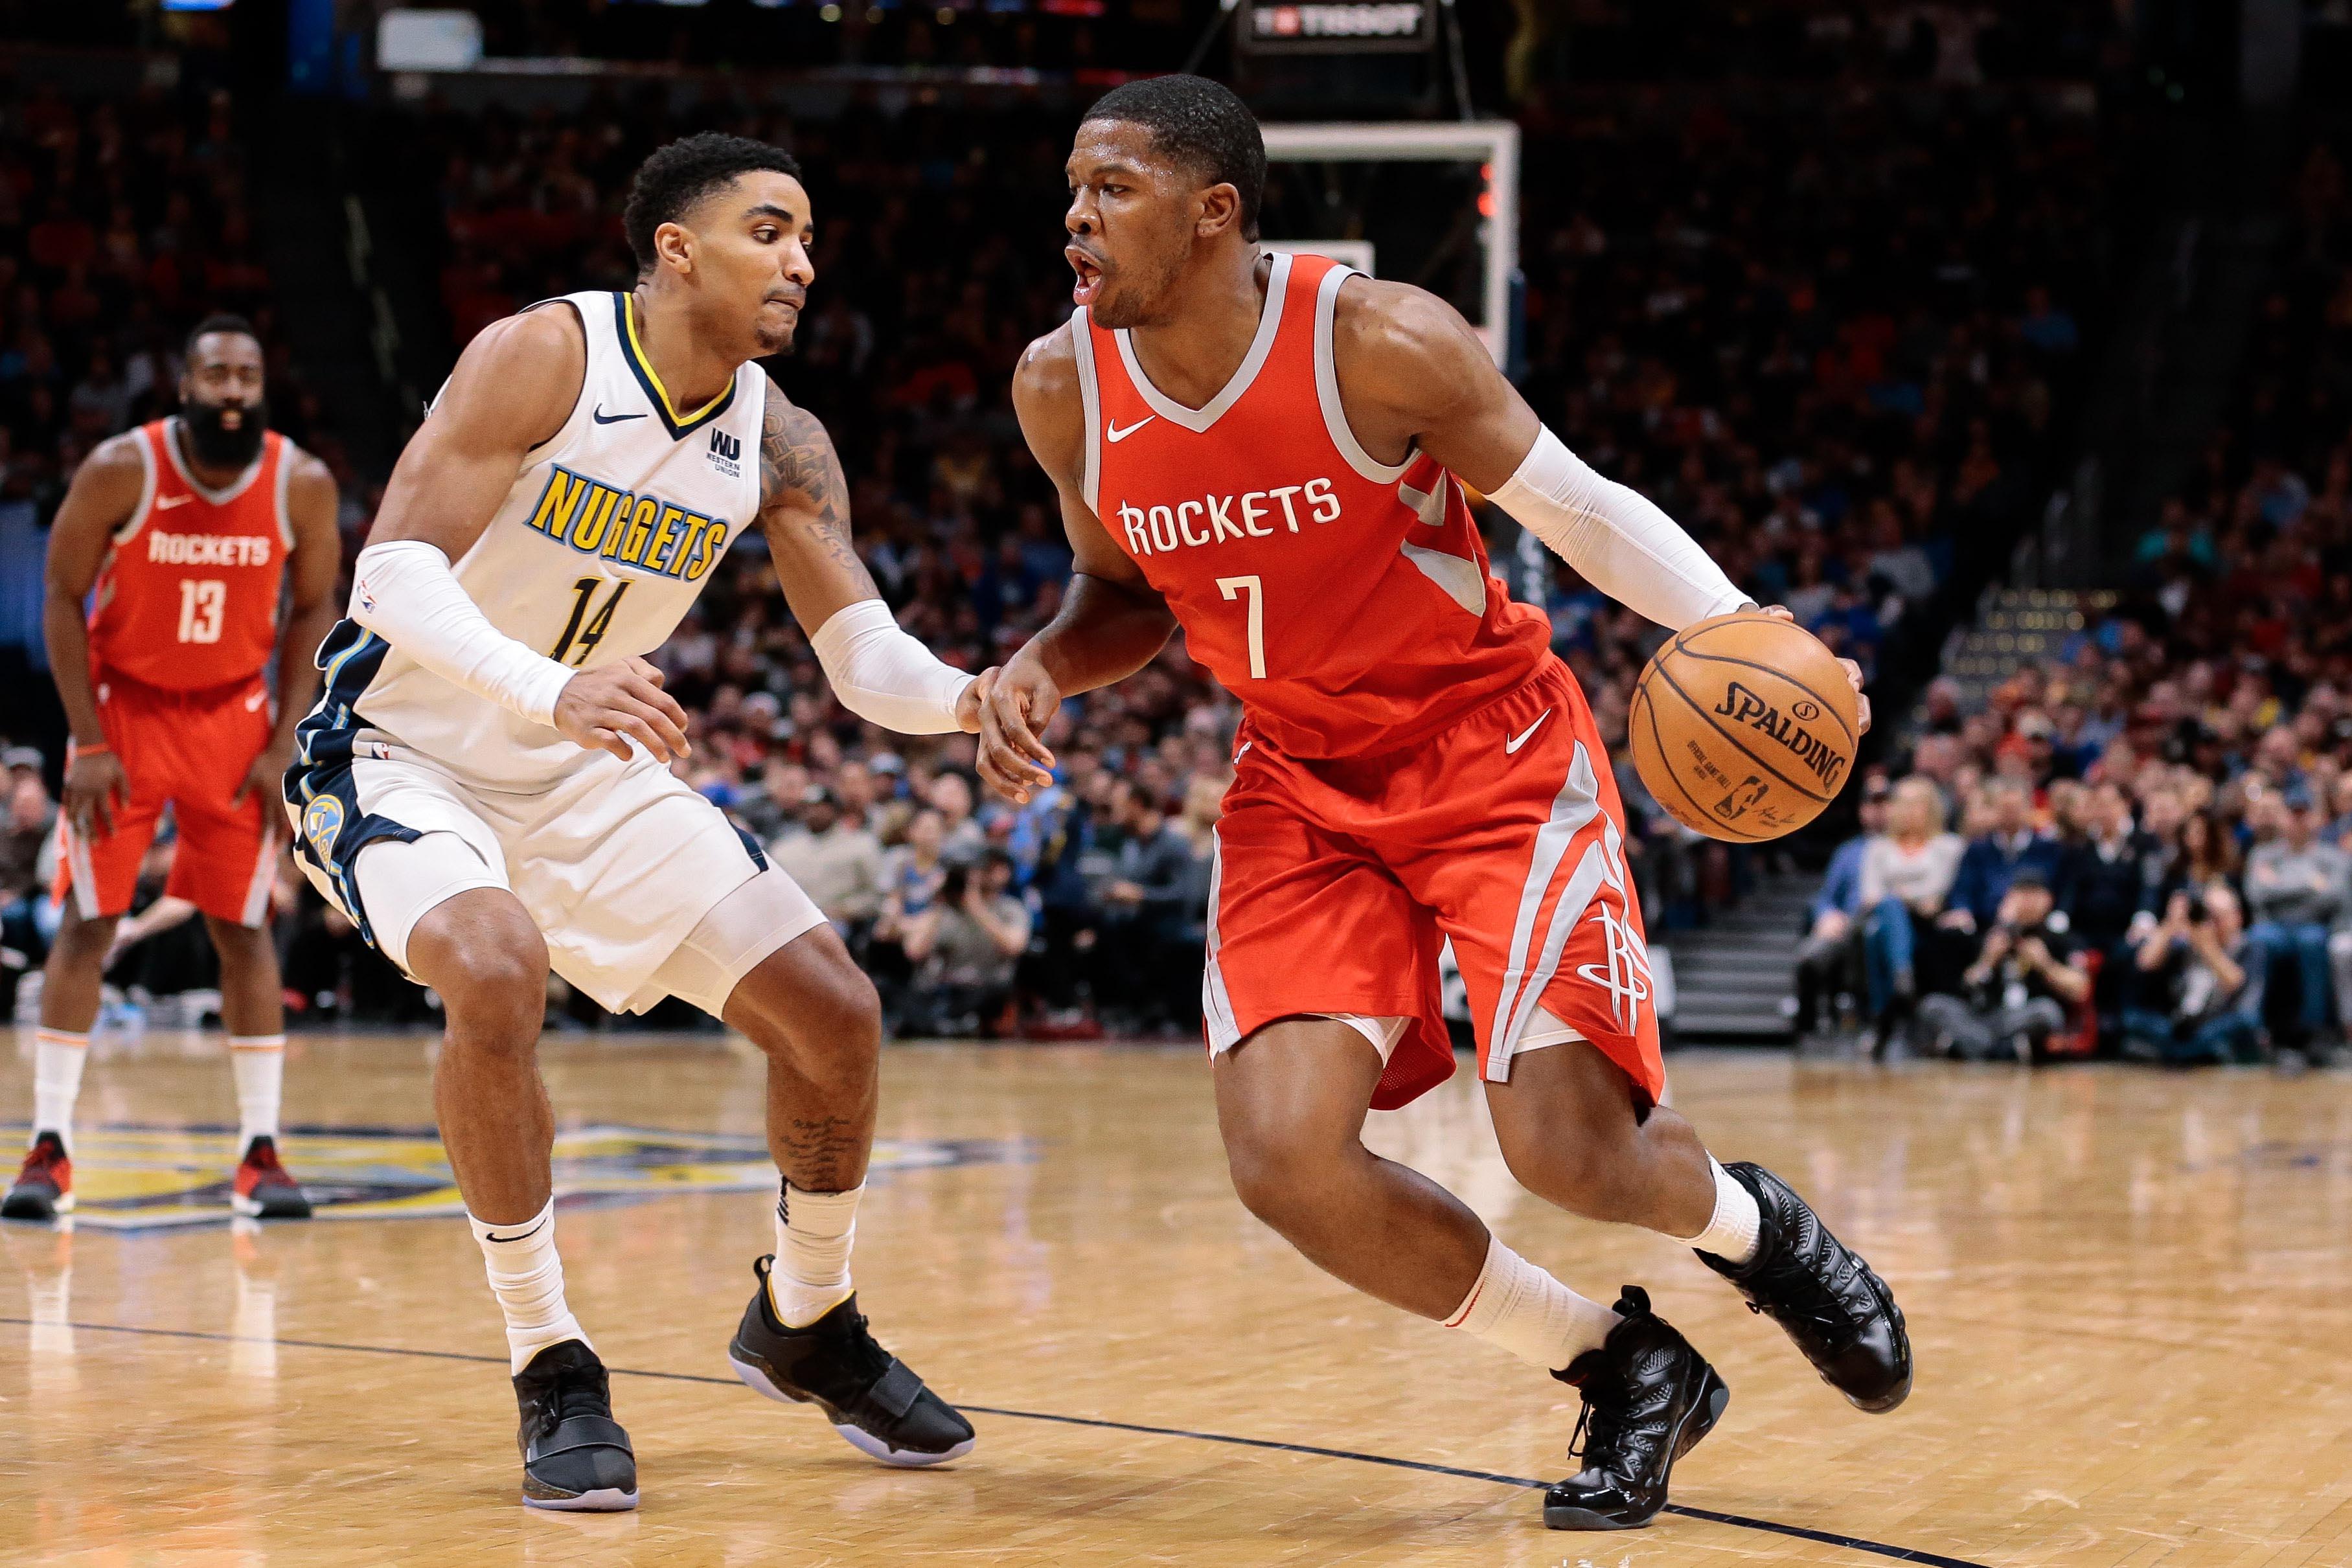 Denver Nuggets guard Gary Harris (14) guards Houston Rockets guard Joe Johnson (7) in the fourth quarter at the Pepsi Center.